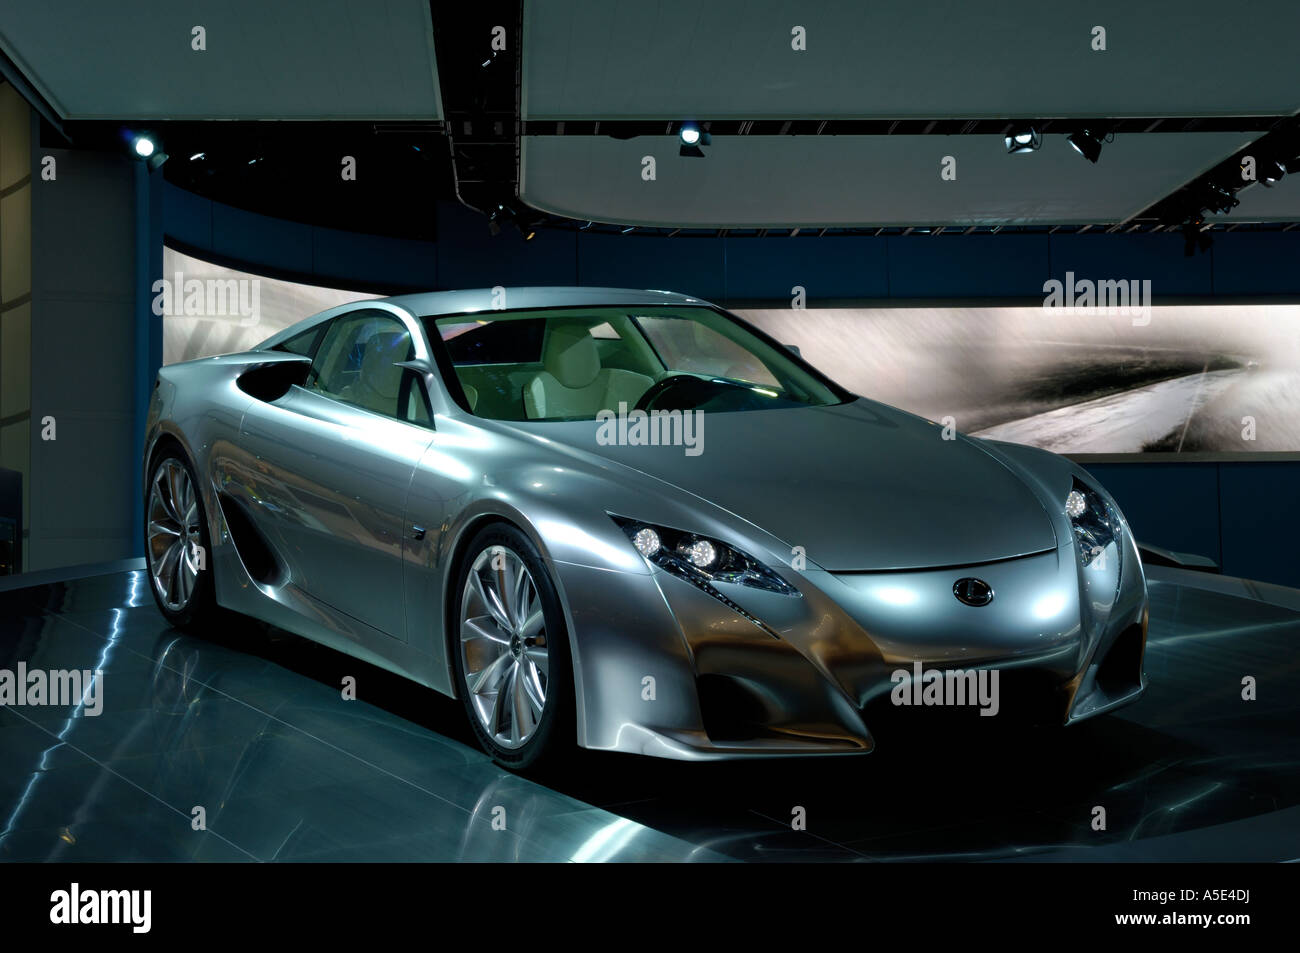 https://c8.alamy.com/comp/A5E4DJ/the-2007-lexus-lf-a-concept-car-at-the-north-american-international-A5E4DJ.jpg